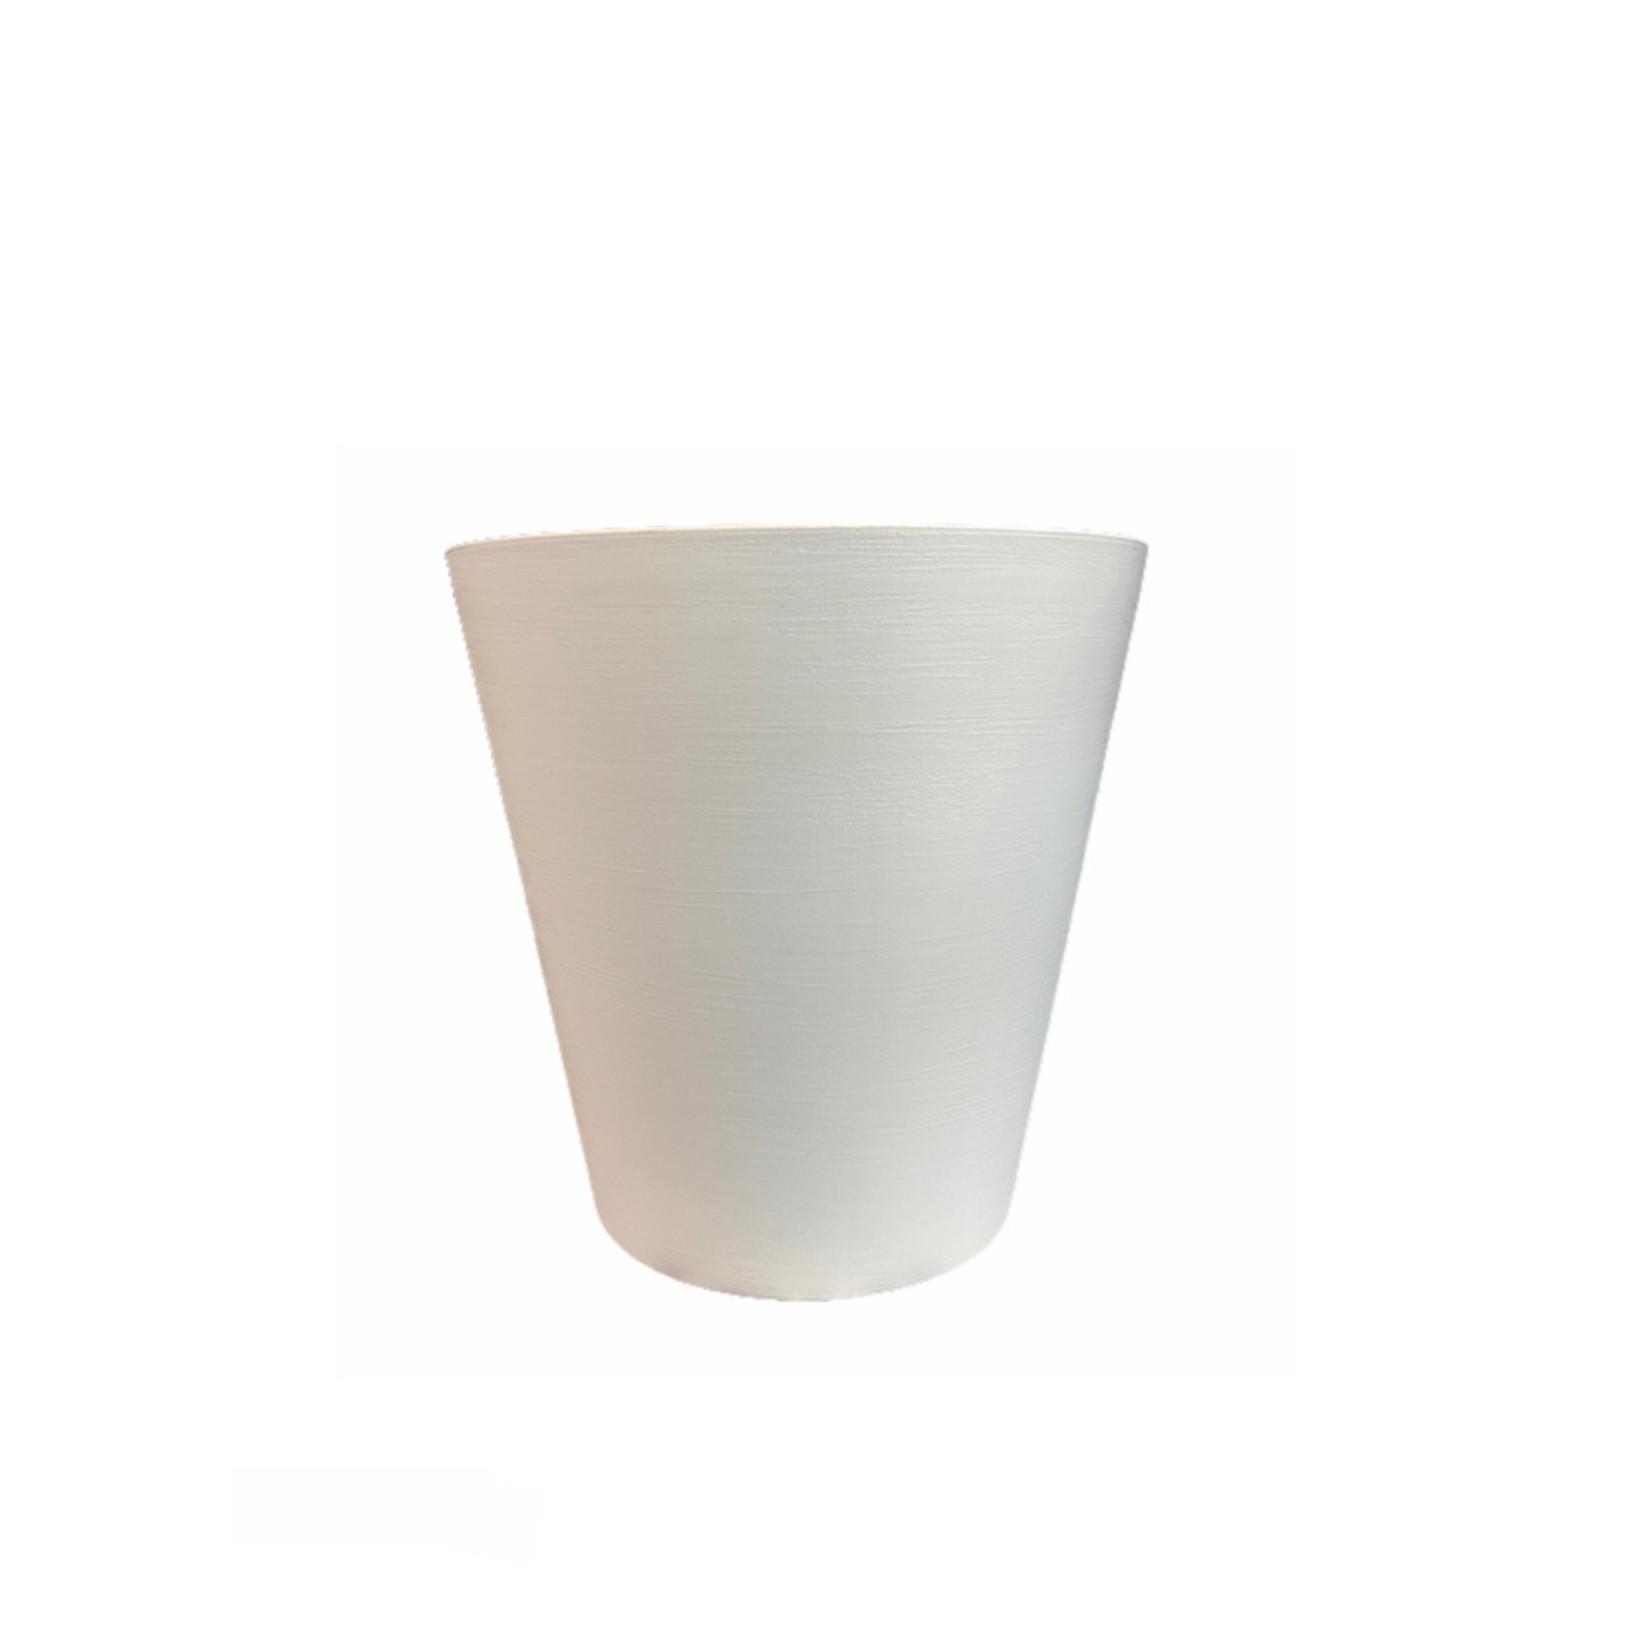 Teraplast Repot Hoop White 16cm